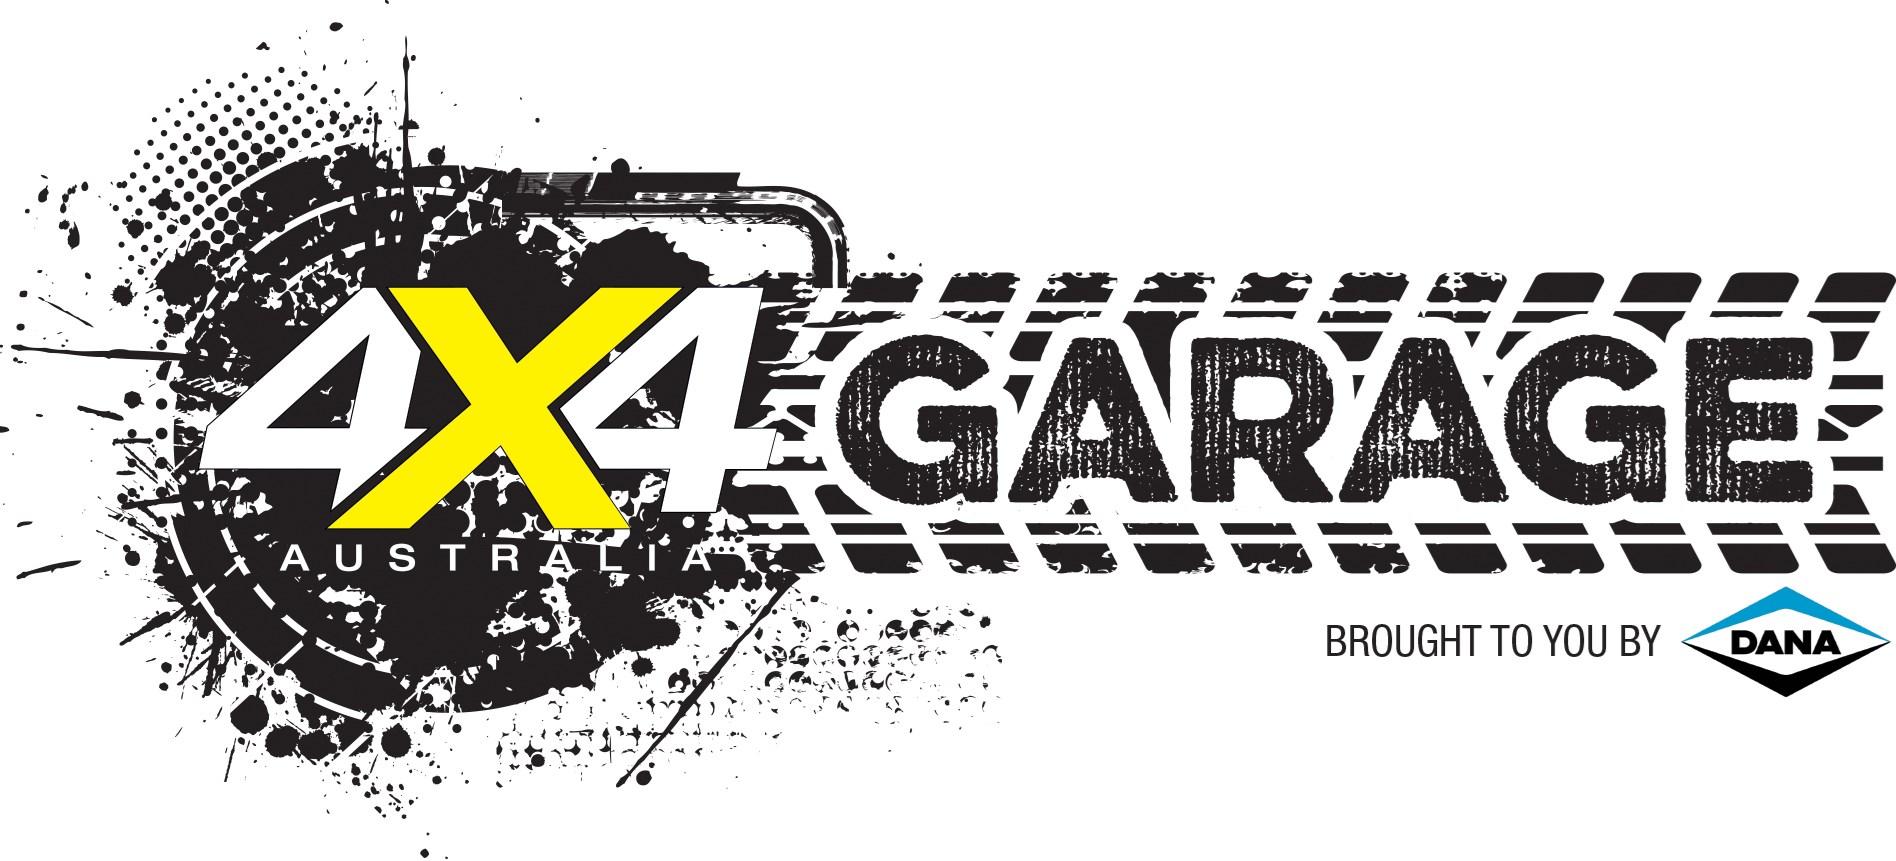 4x4 Garage  4x4 Australia